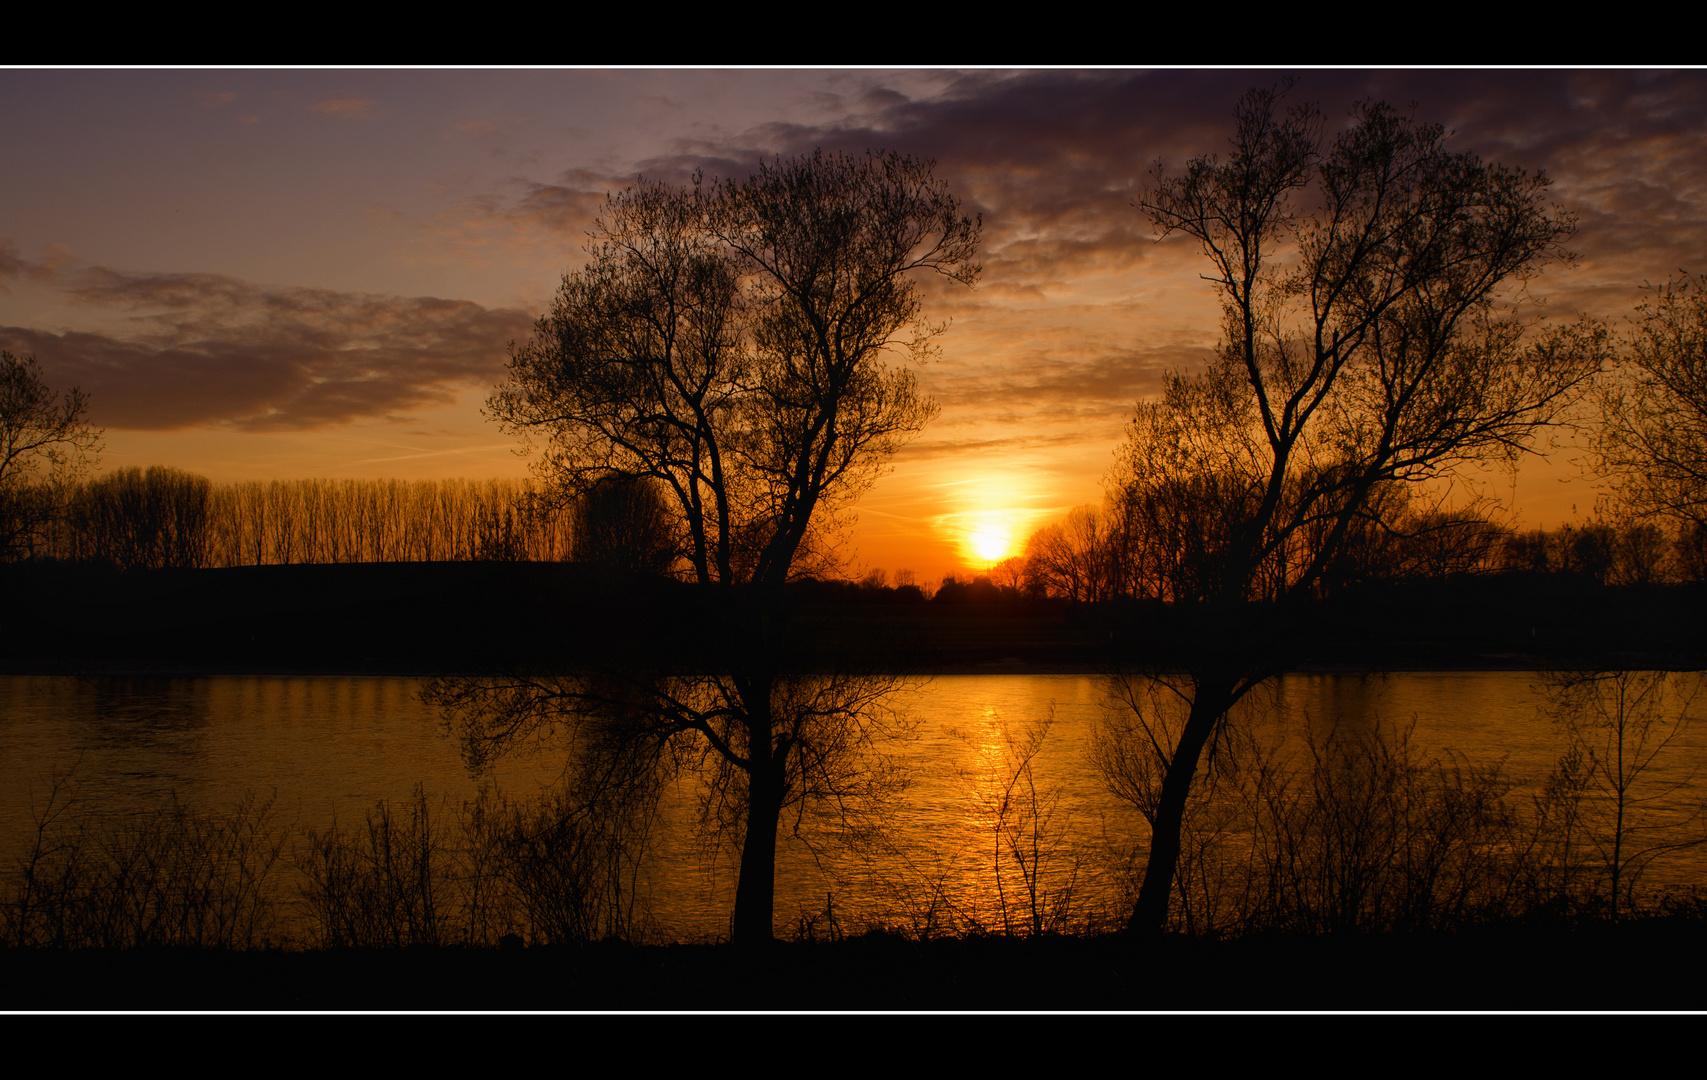 Sonnenuntergang am Rhein in Monheim